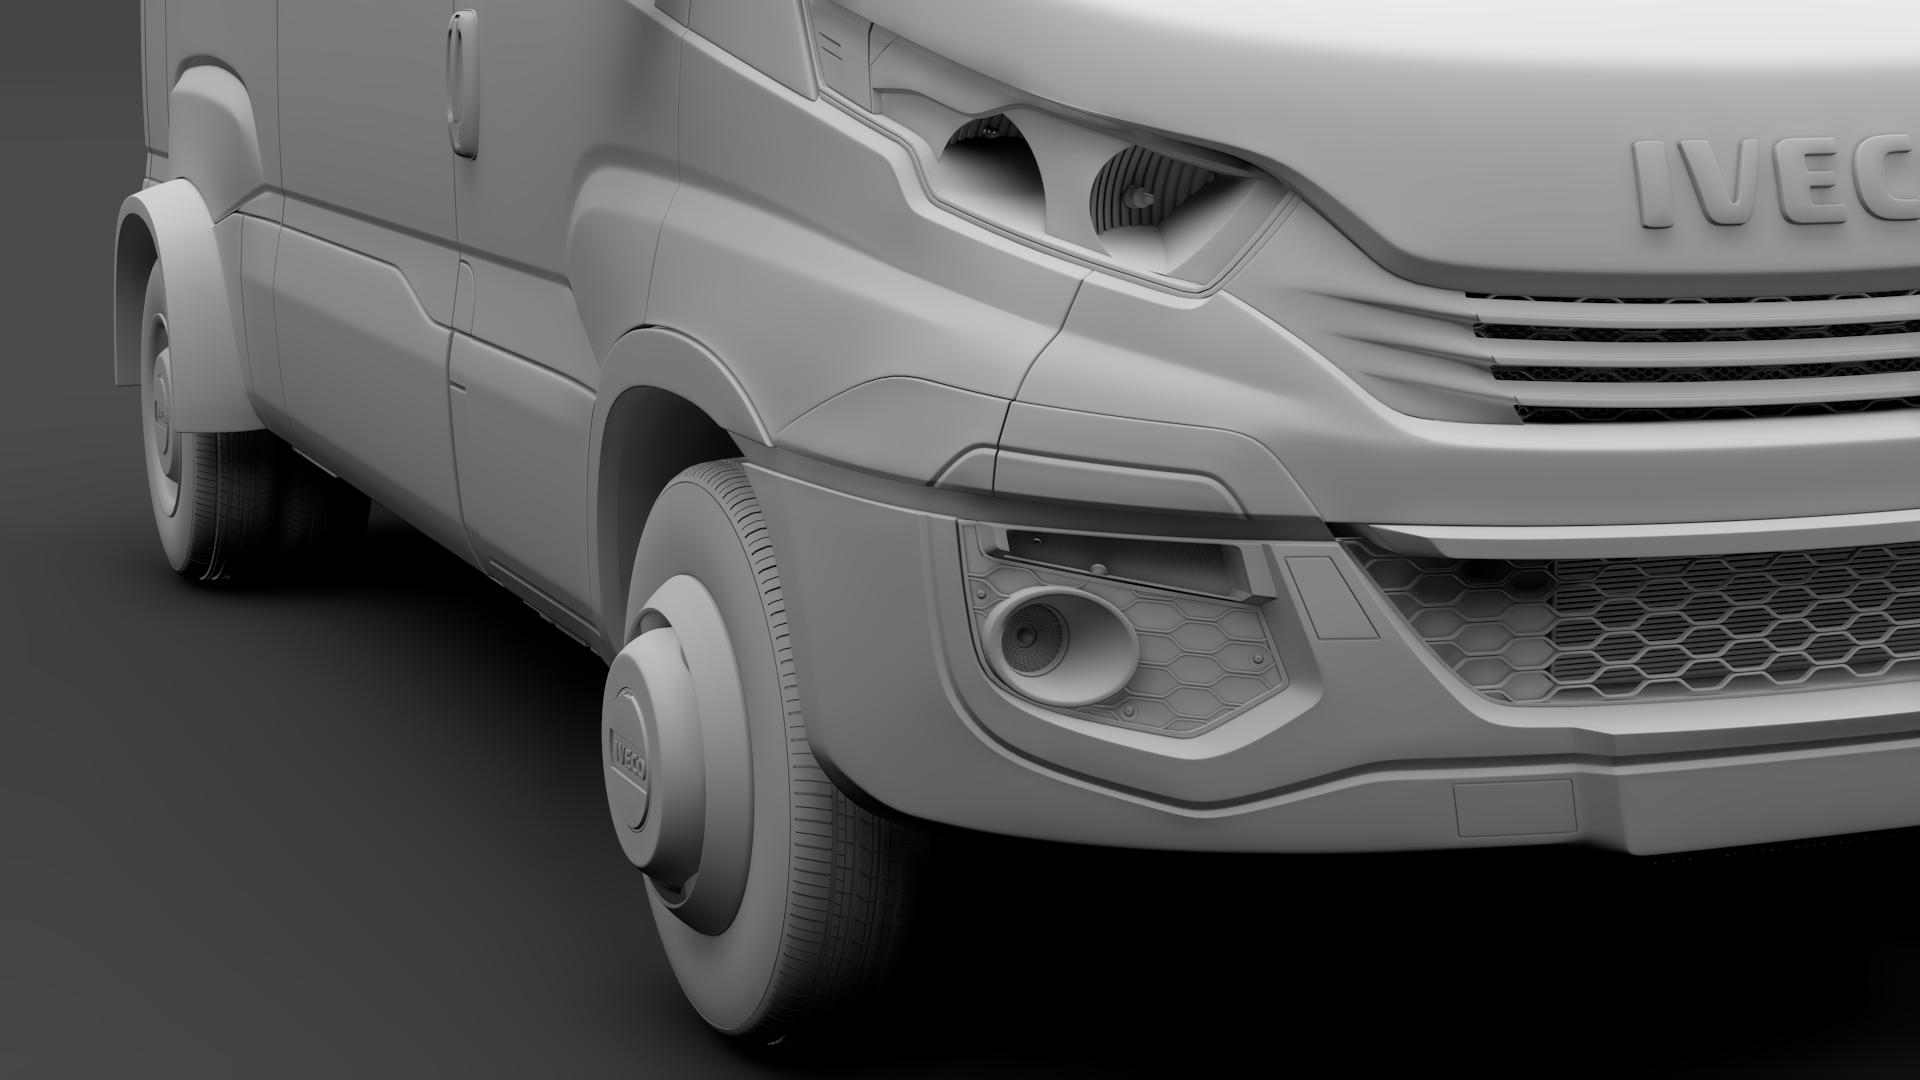 iveco daily minibus l2h2 2017 3d model max fbx c4d lwo ma mb hrc xsi obj 276020